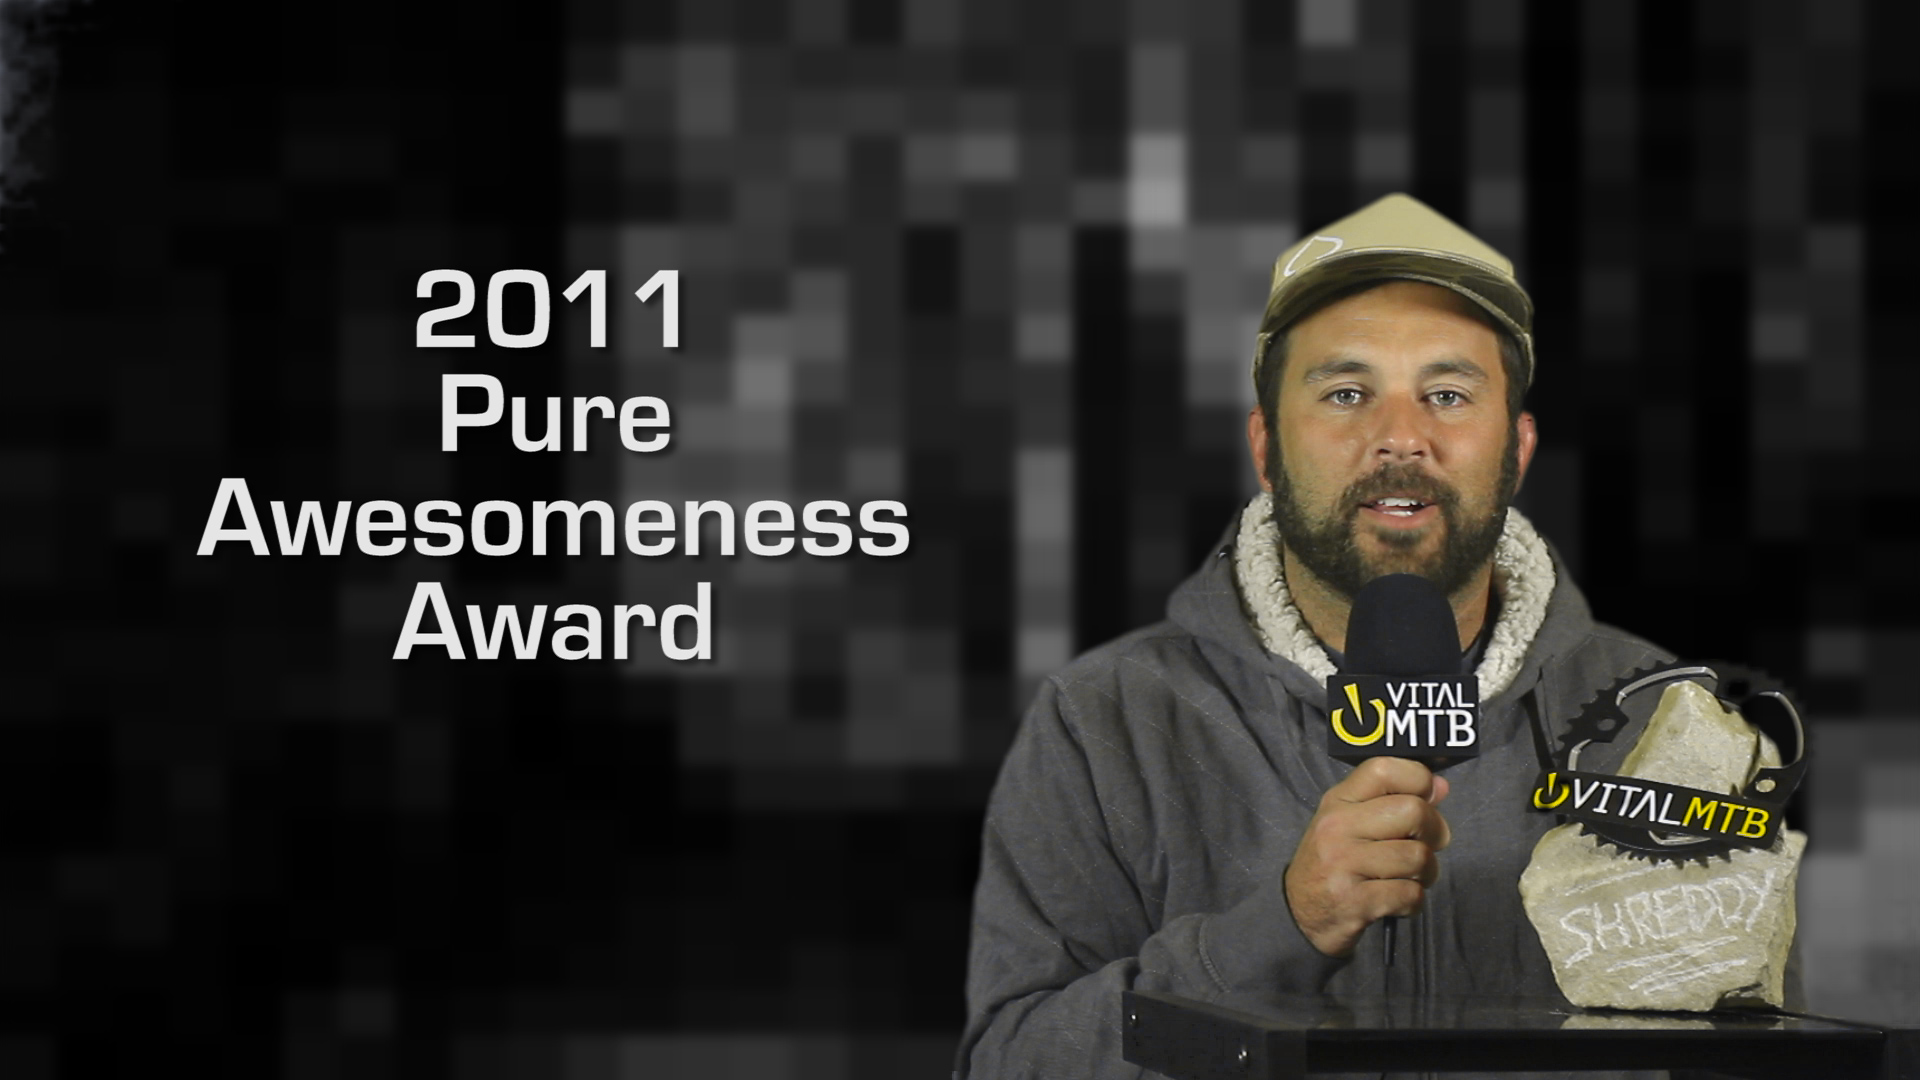 2011 Vital MTB Shreddy Awards - Pure Awesomeness Honors